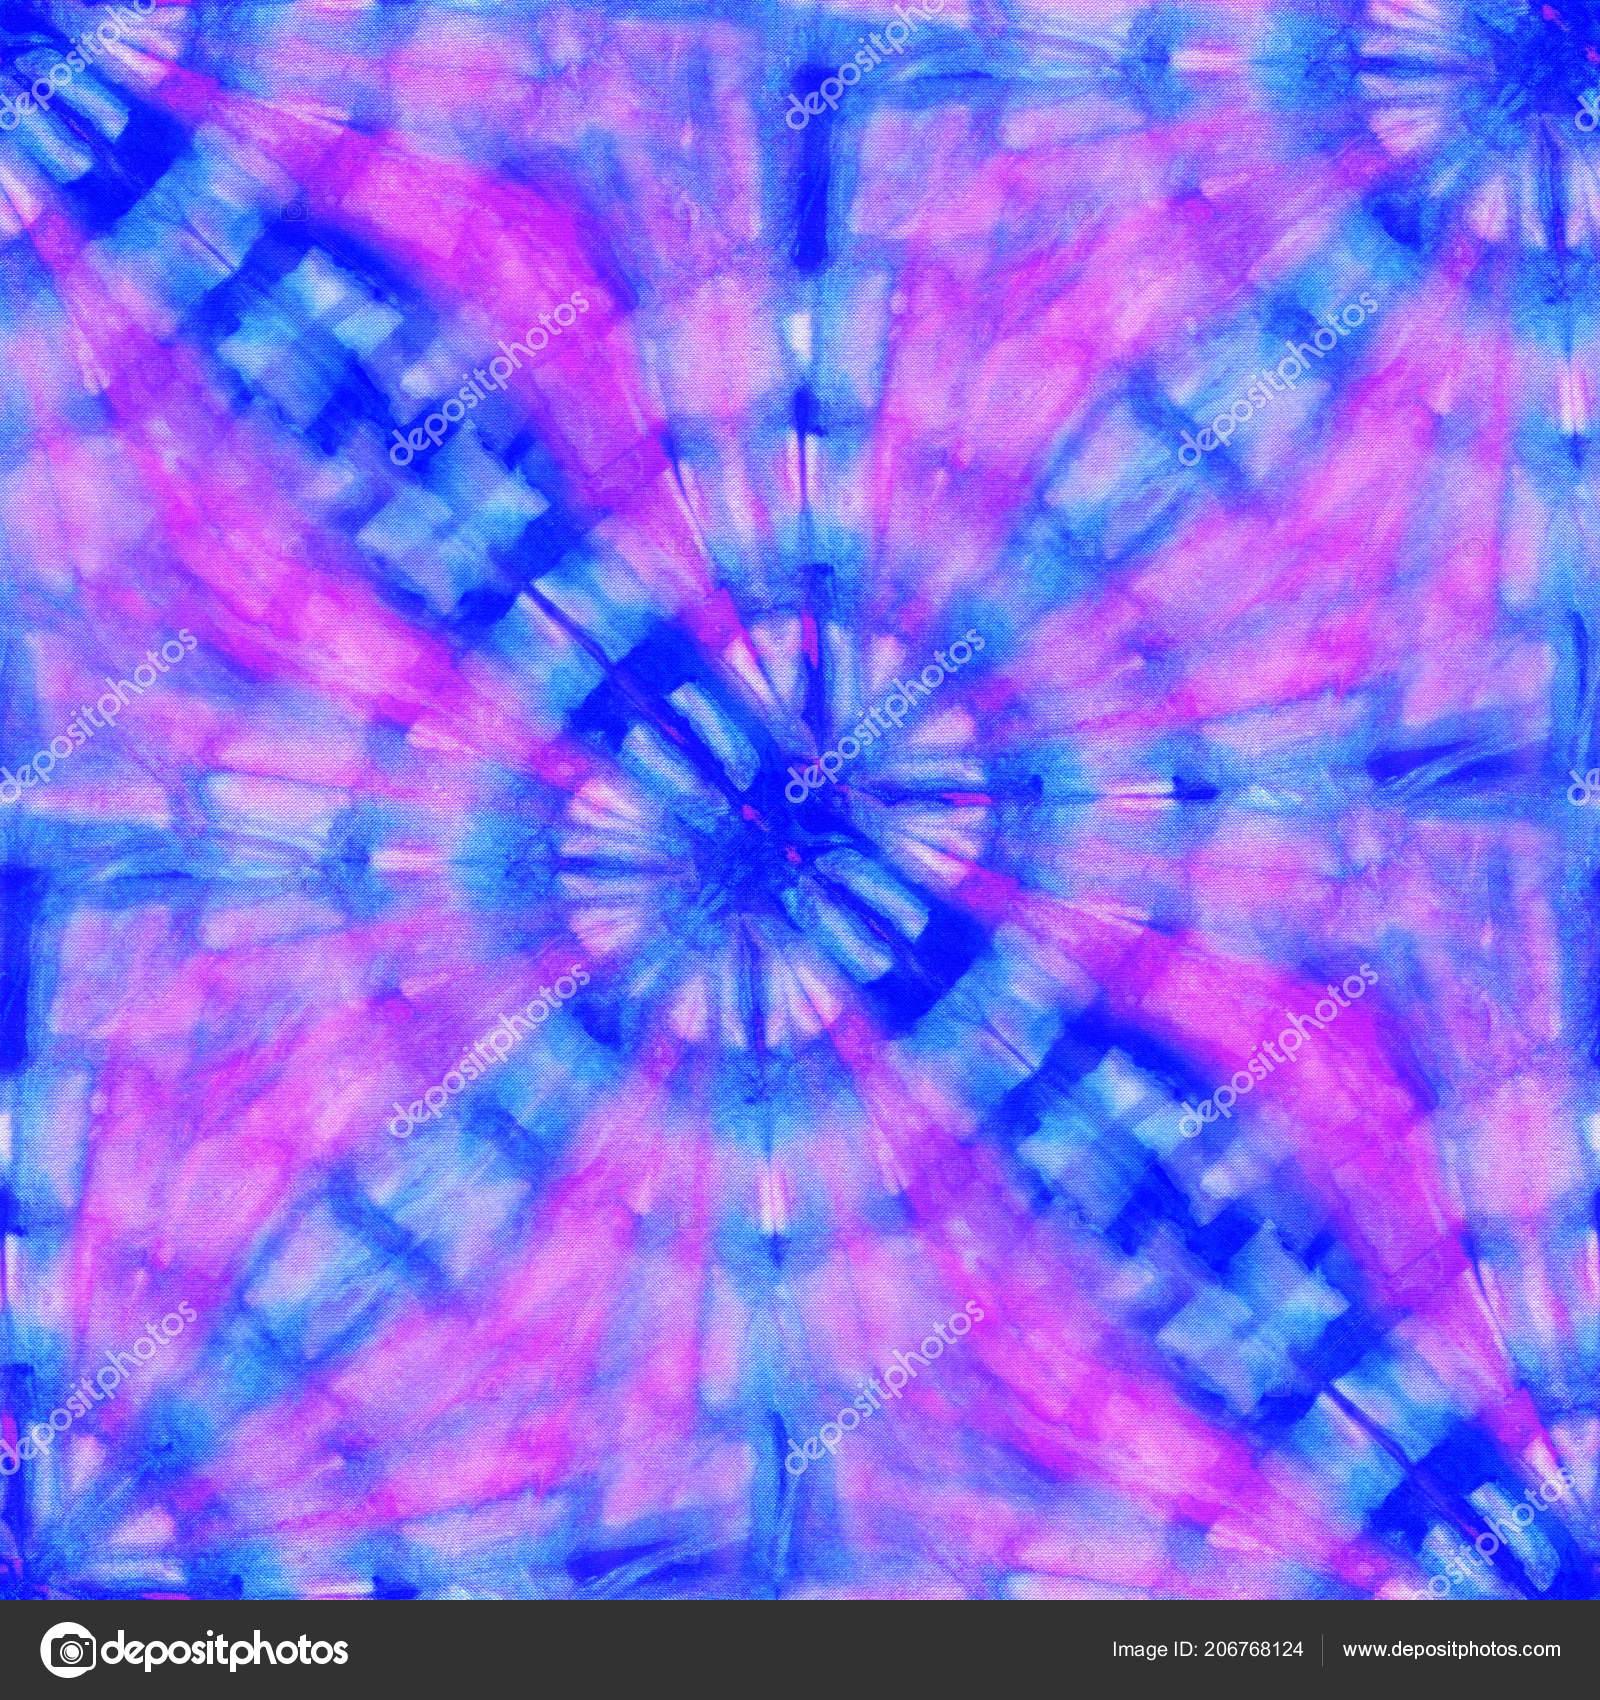 ea4930a1fa0b Seamless tie-dye pattern of blue and pink color on white silk. Hand painting  fabrics - nodular batik. Shibori dyeing. — Photo by tiff20